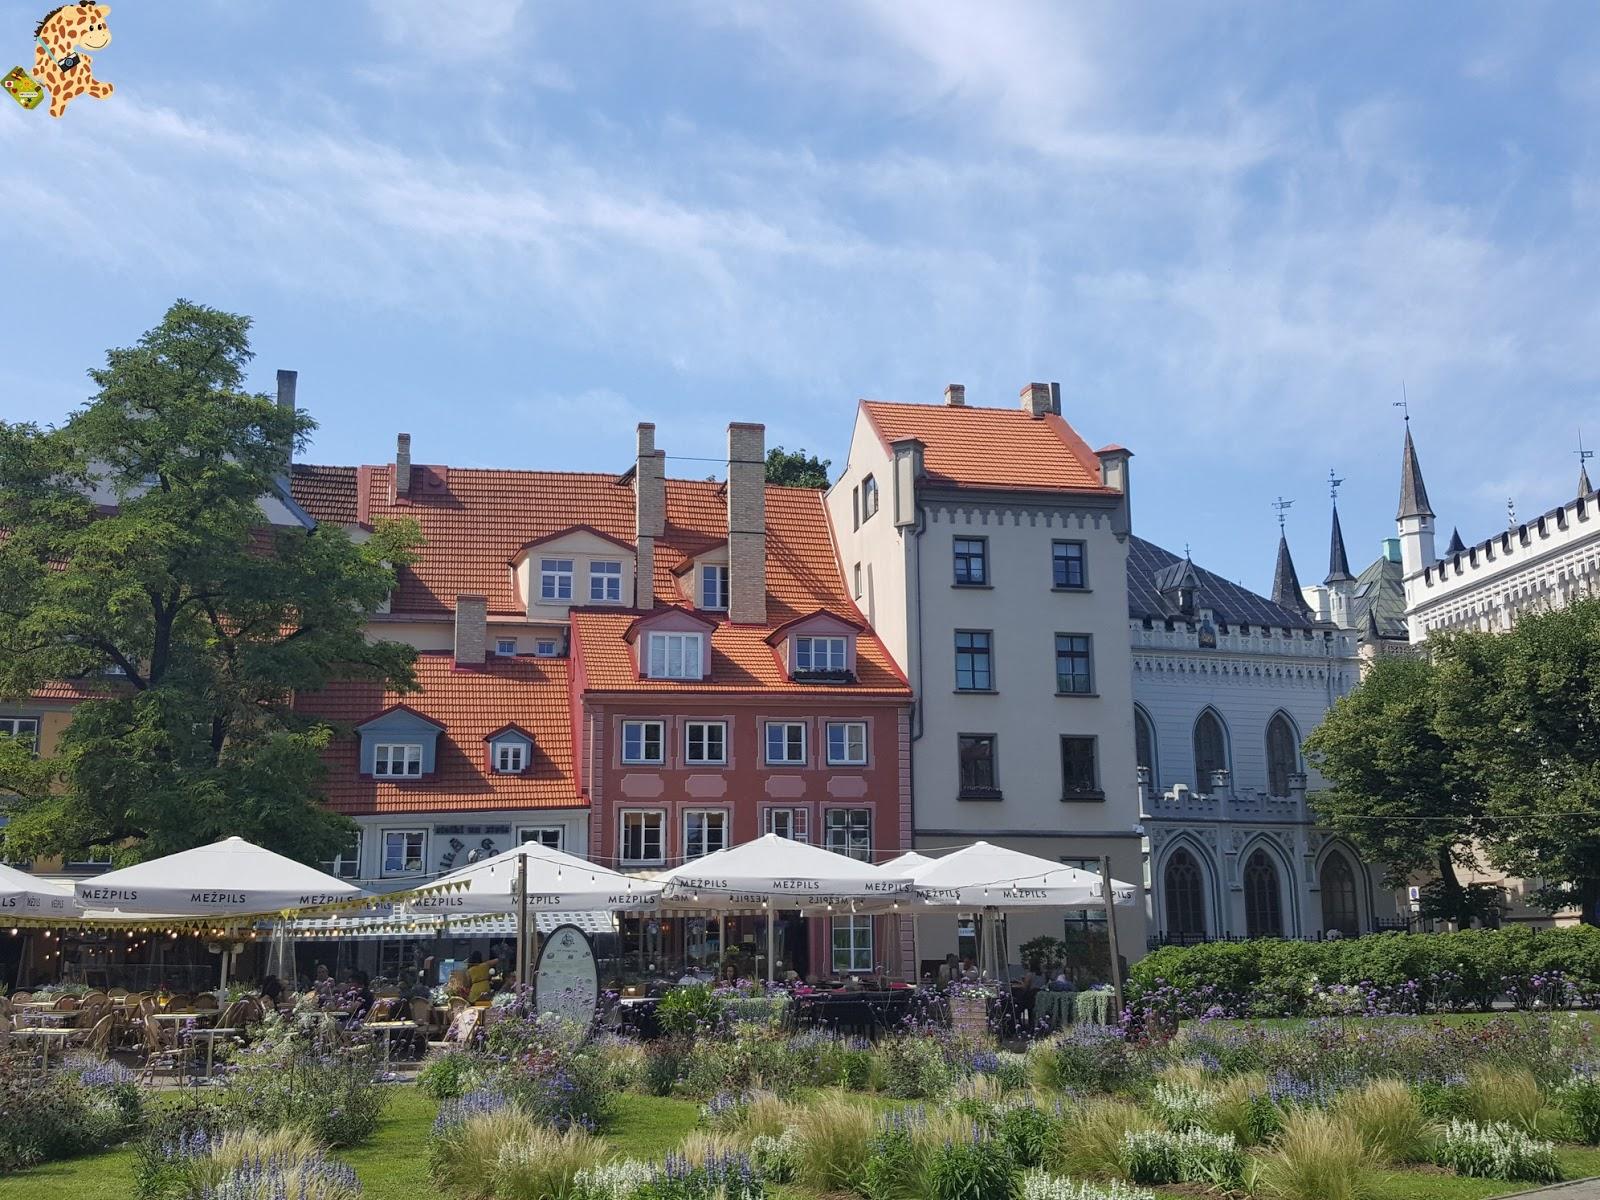 estonialetonialituaniahelsinki281329 - Estonia, Letonia y Lituania (+ Helsinki) en 15 días: itinerario y presupuesto